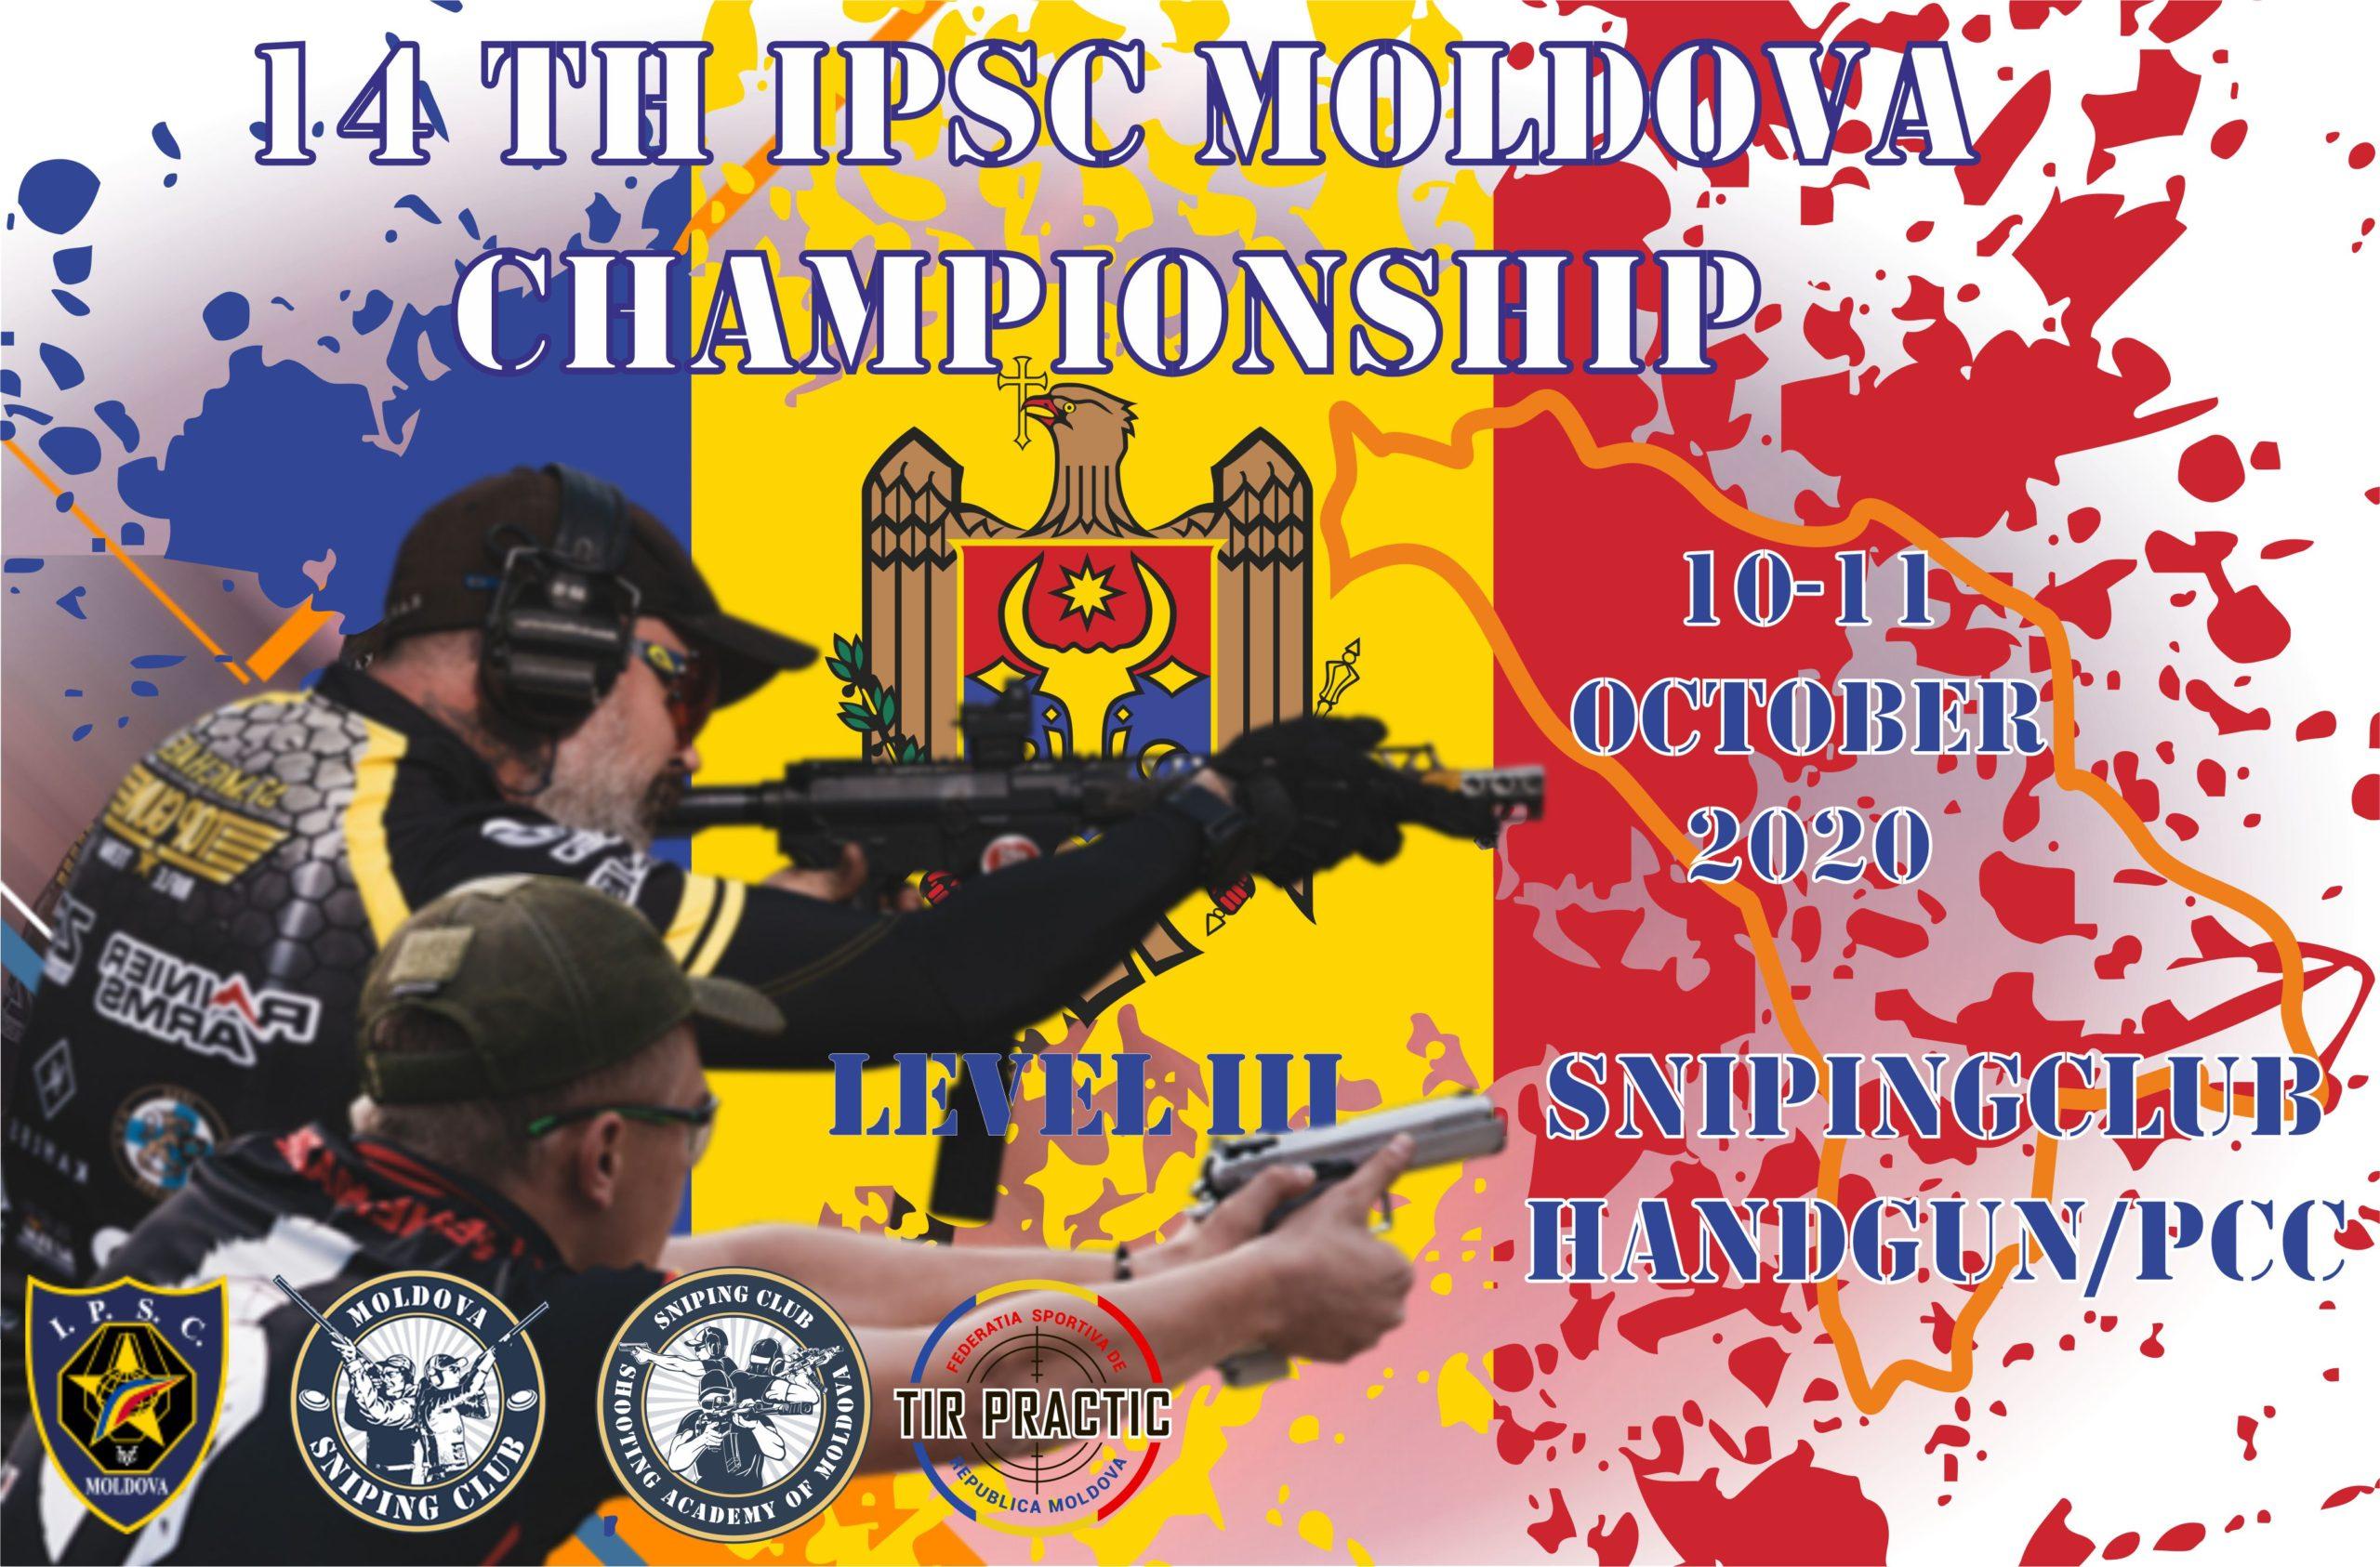 14 Th IPSC MOLDOVA CHAMPIONSHIP